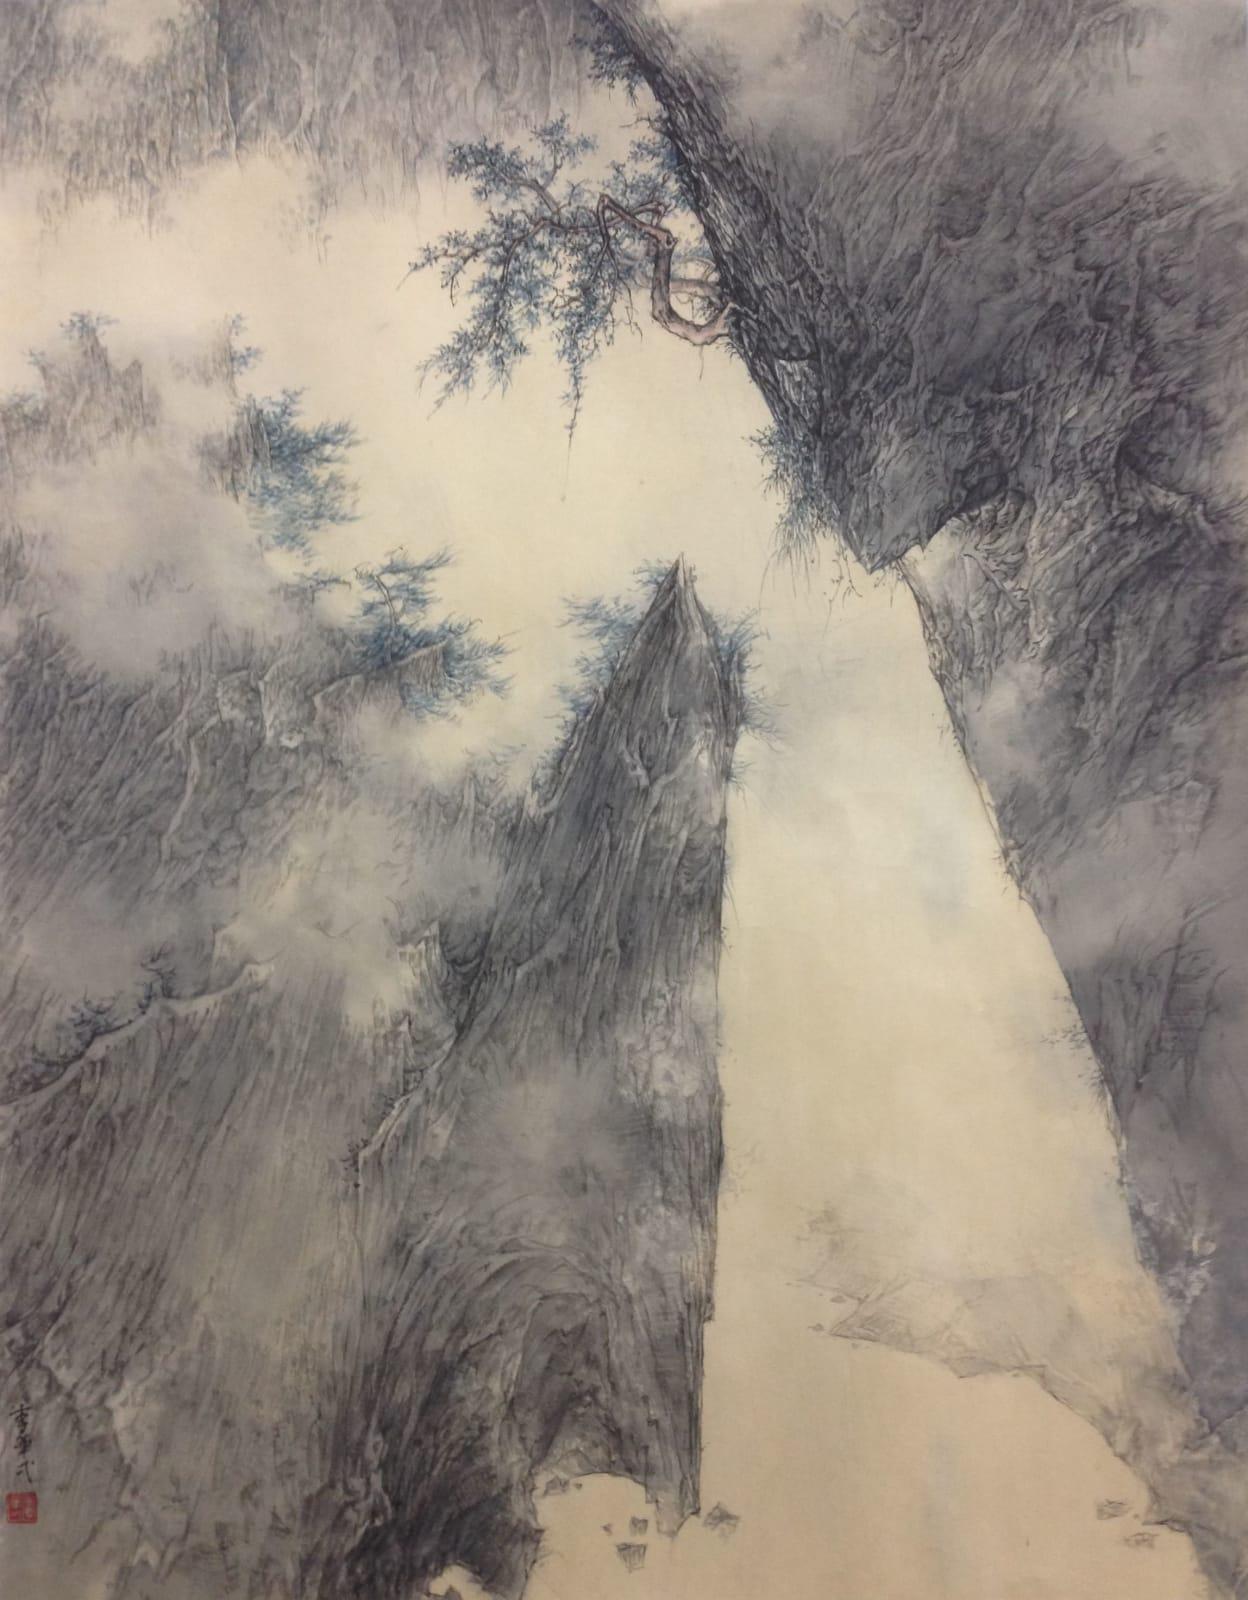 Li Huayi 李華弌, Untitled《無題》, 2016